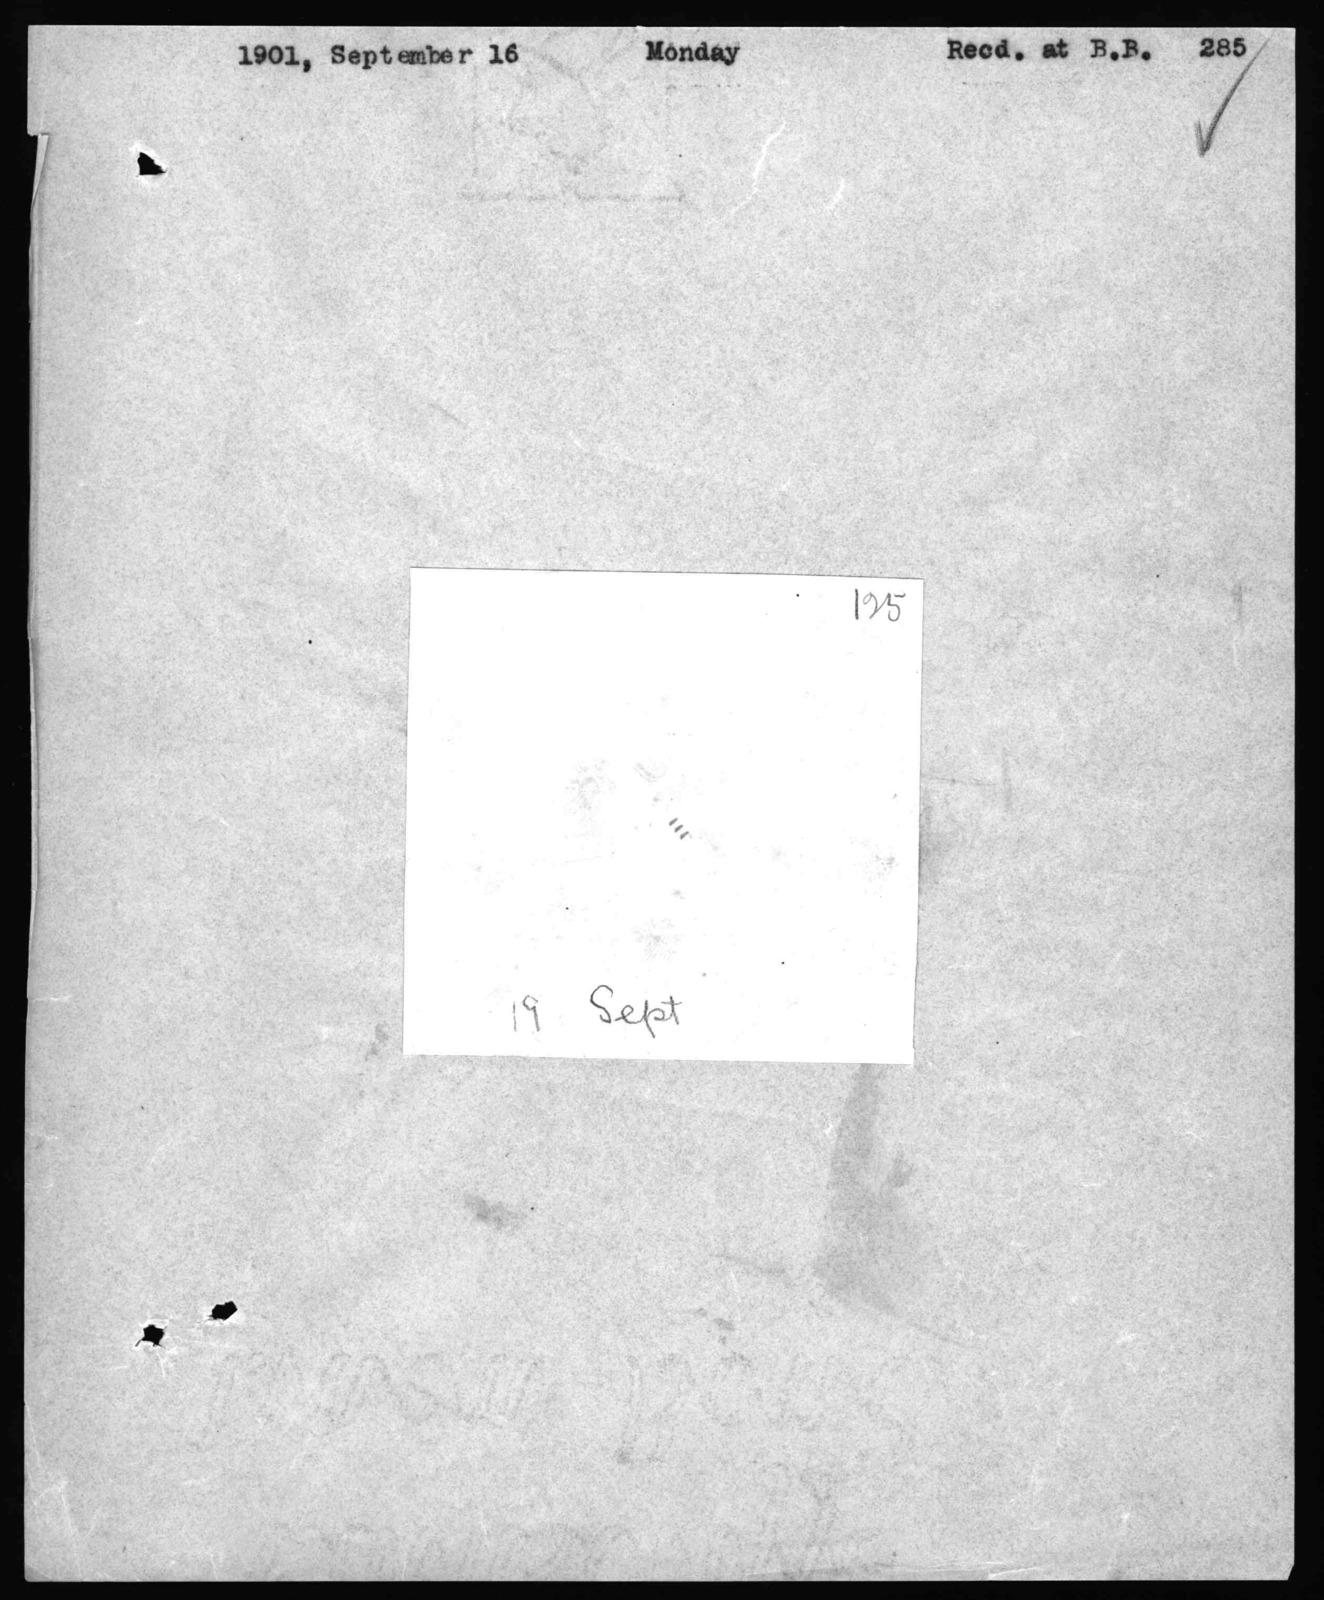 Journal by Alexander Graham Bell, from September 2, 1901 to October 29, 1901